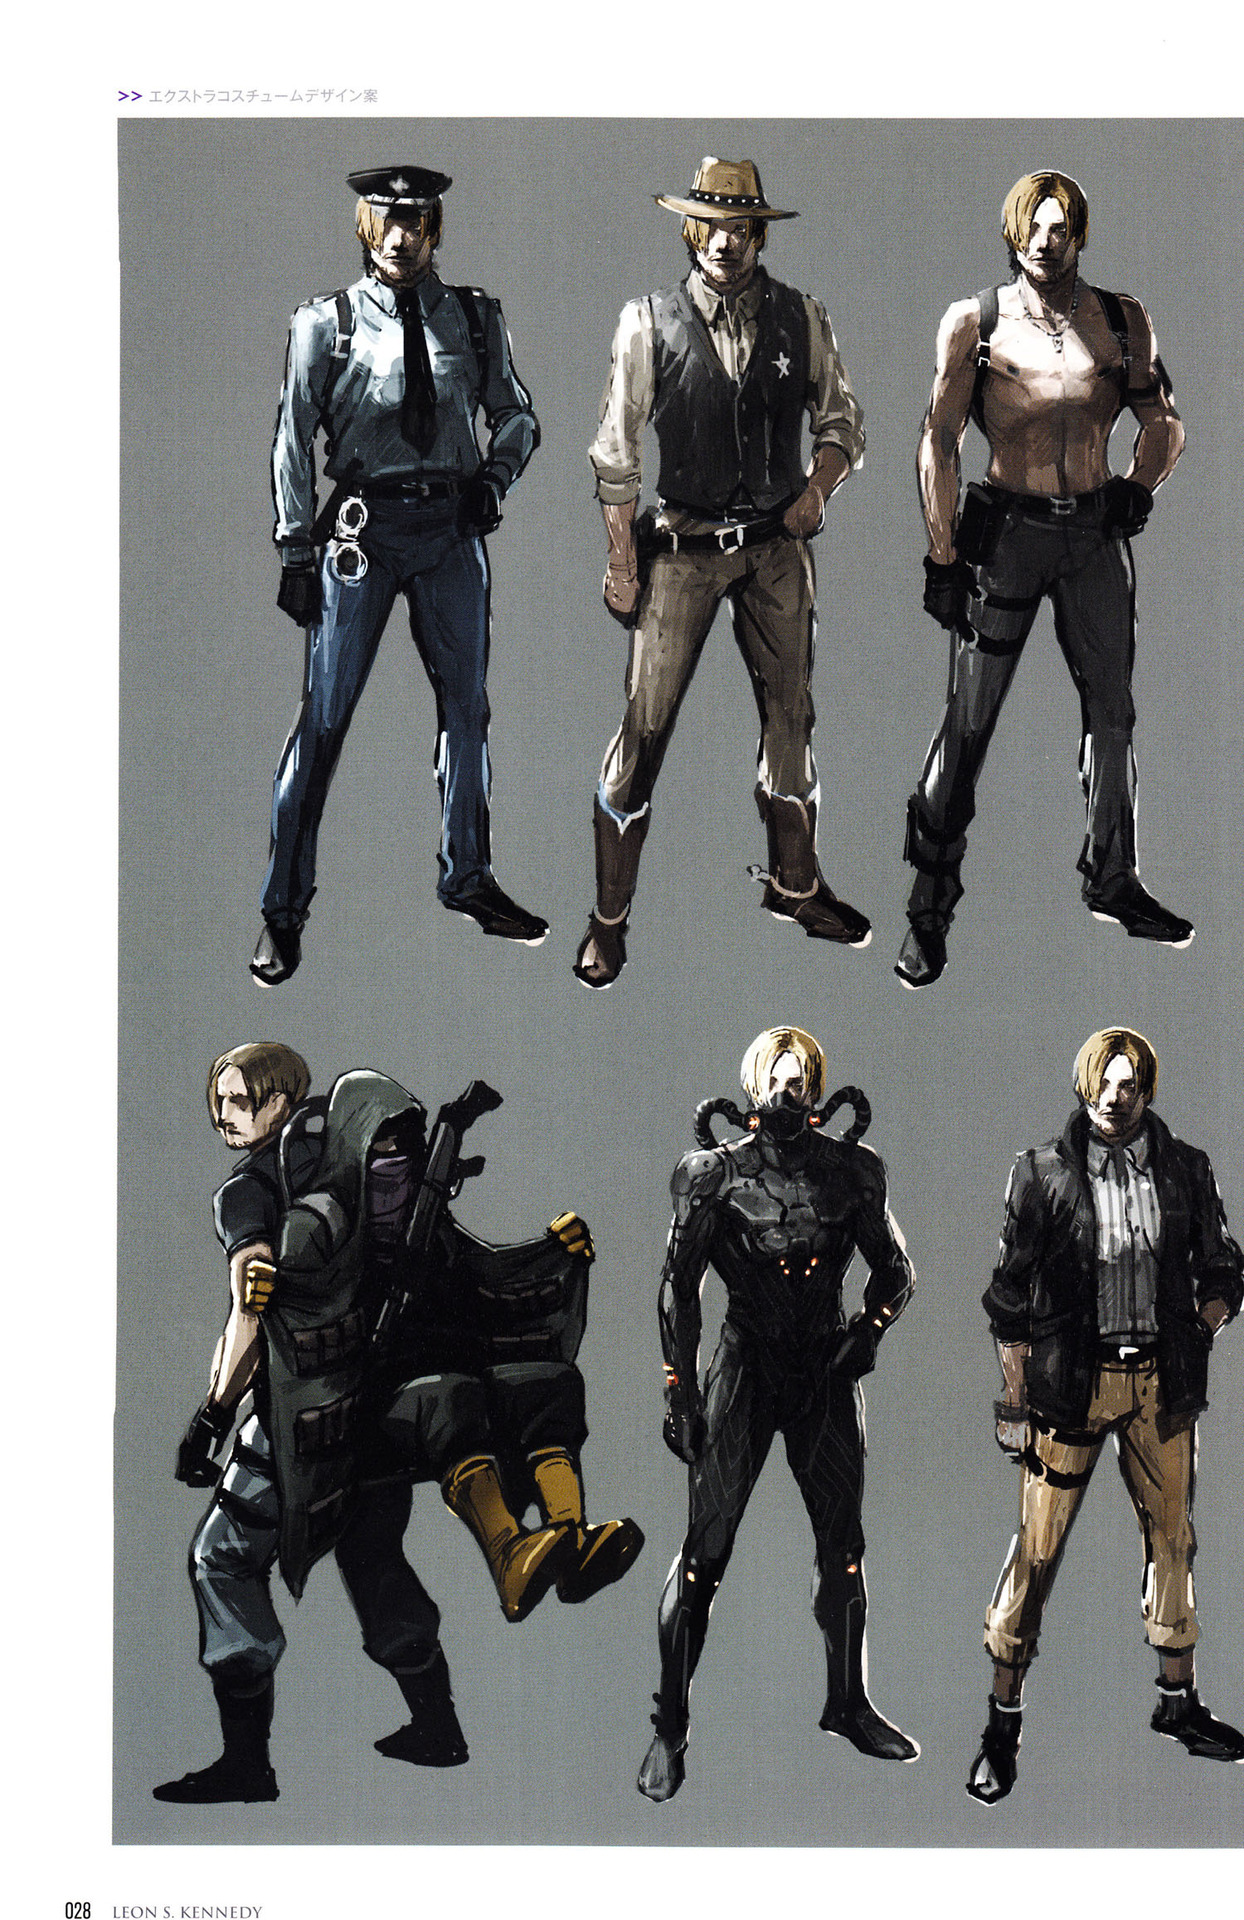 Leon Costume Concepts Re6 1 Resident Evil Biohazard Know Your Meme